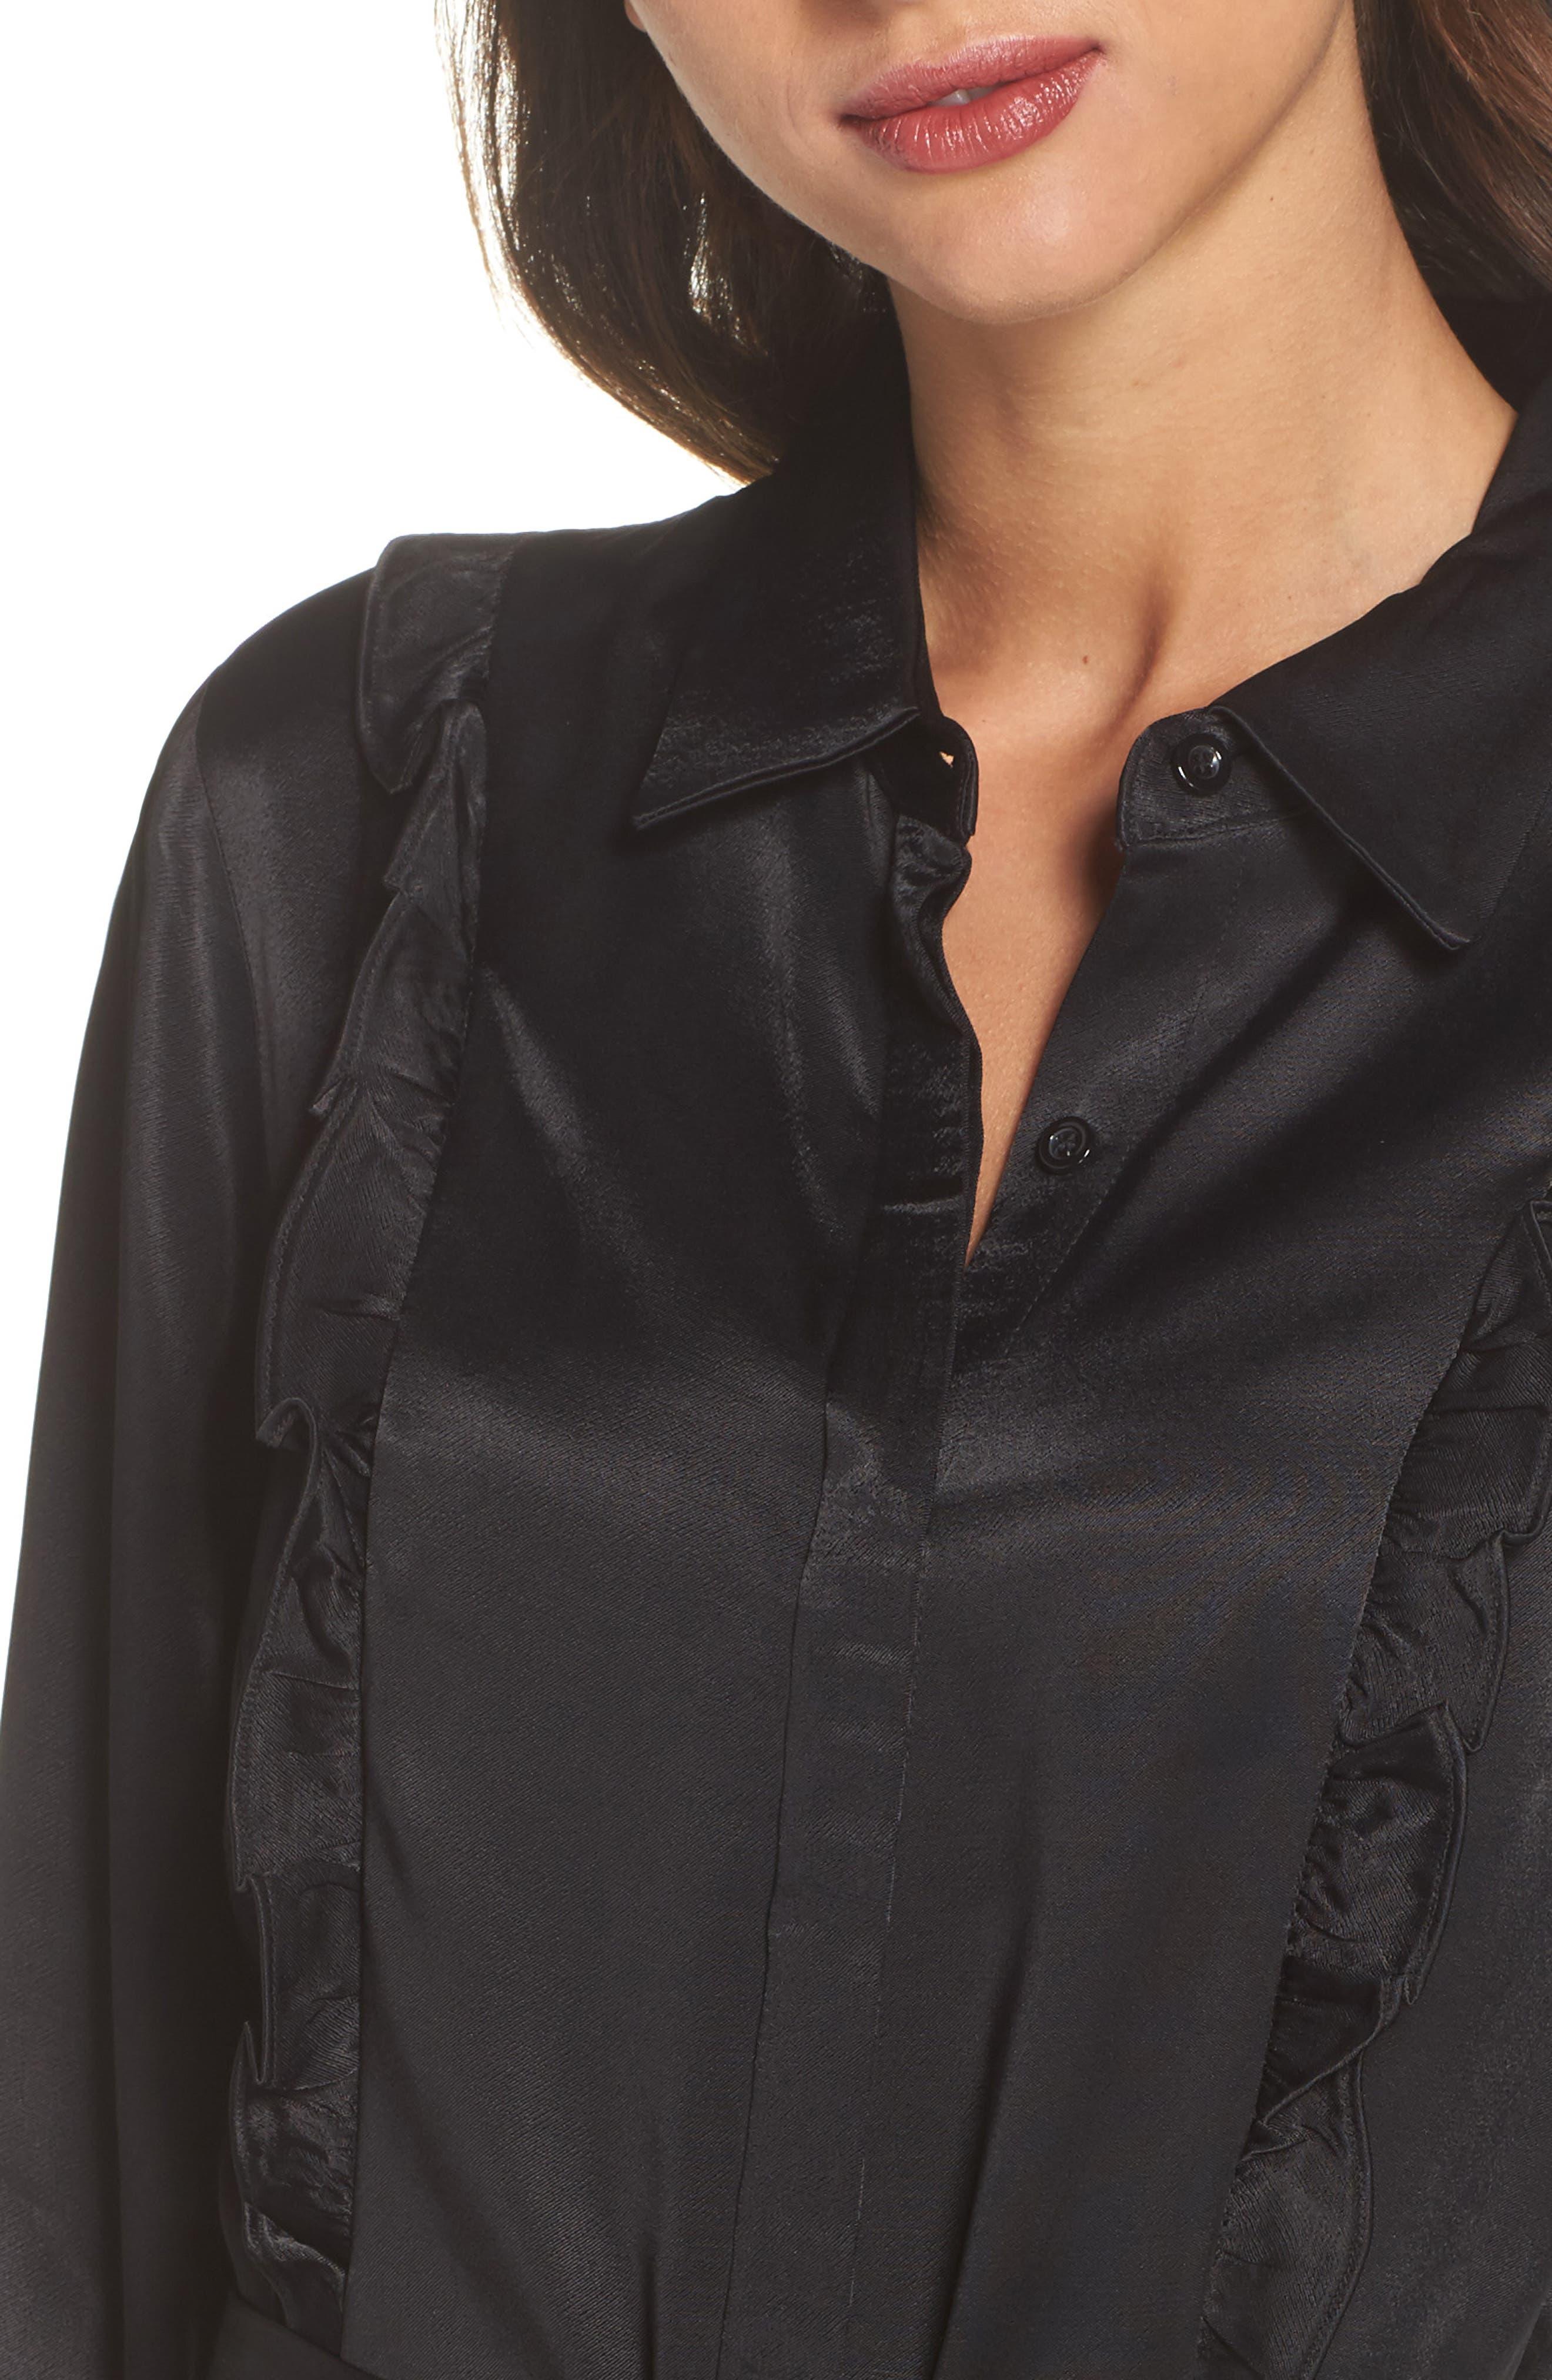 Cassia Ruffle Trim Shirtdress,                             Alternate thumbnail 4, color,                             Black